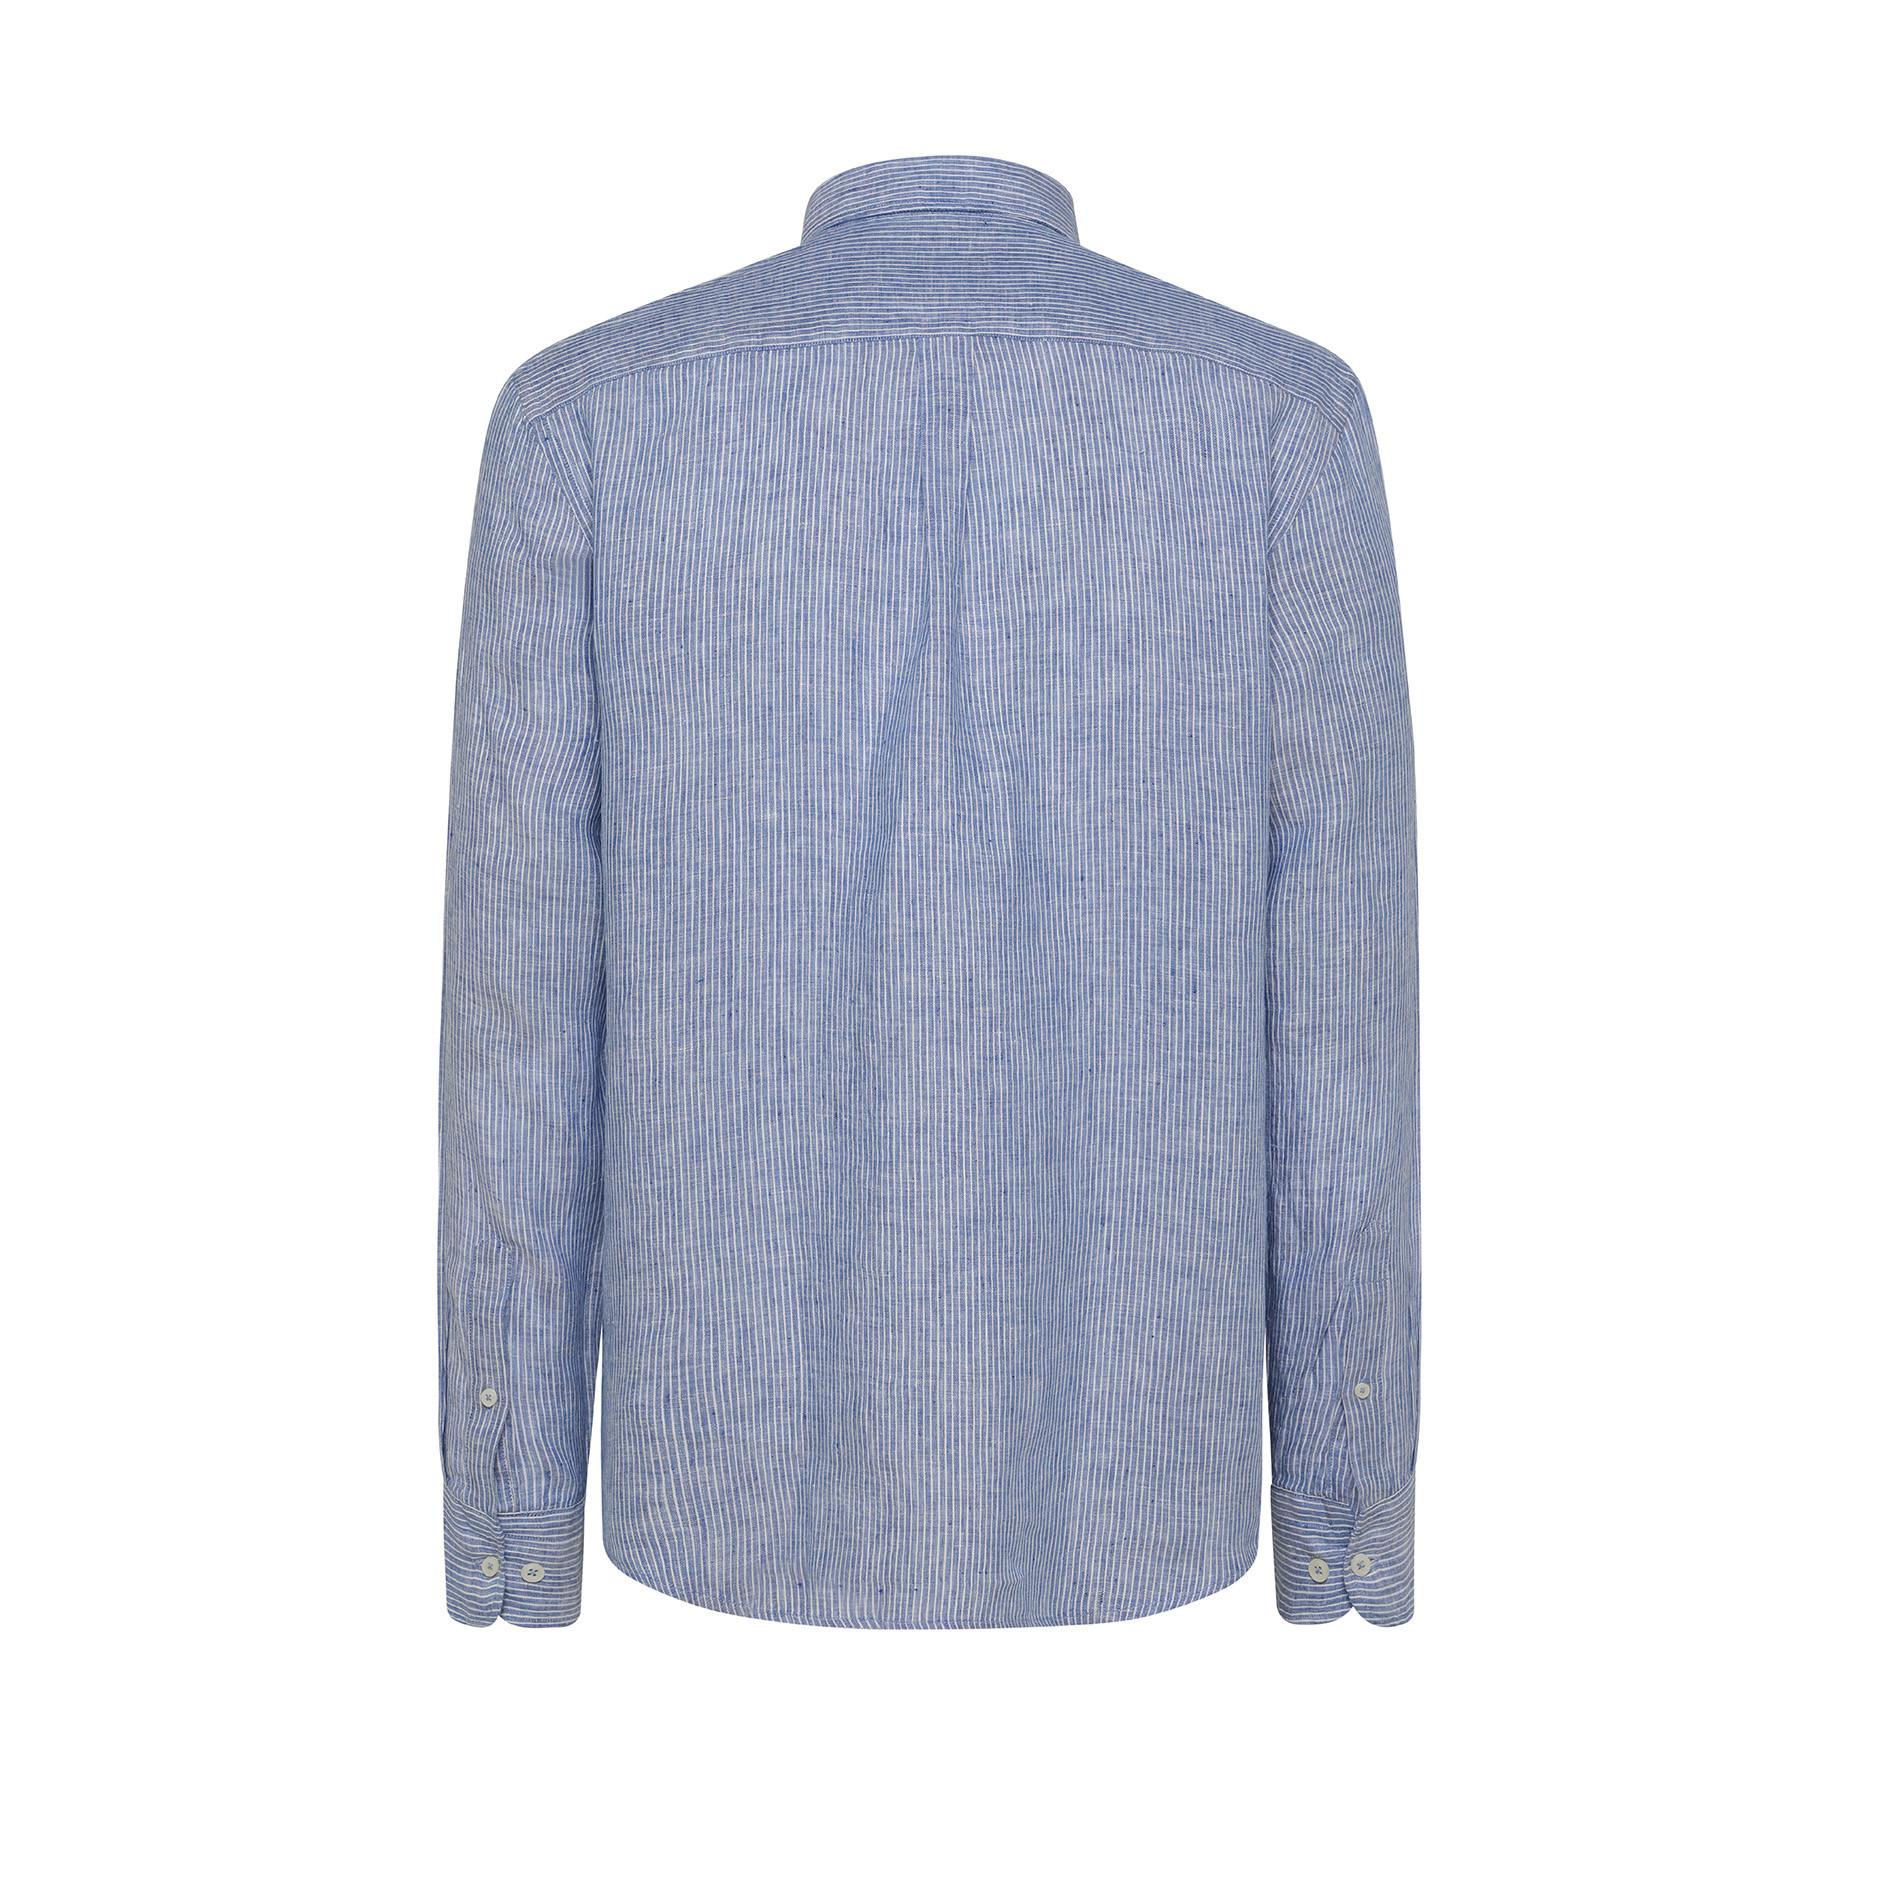 Camicia puro lino tailor fit Luca D'Altieri, Azzurro, large image number 1